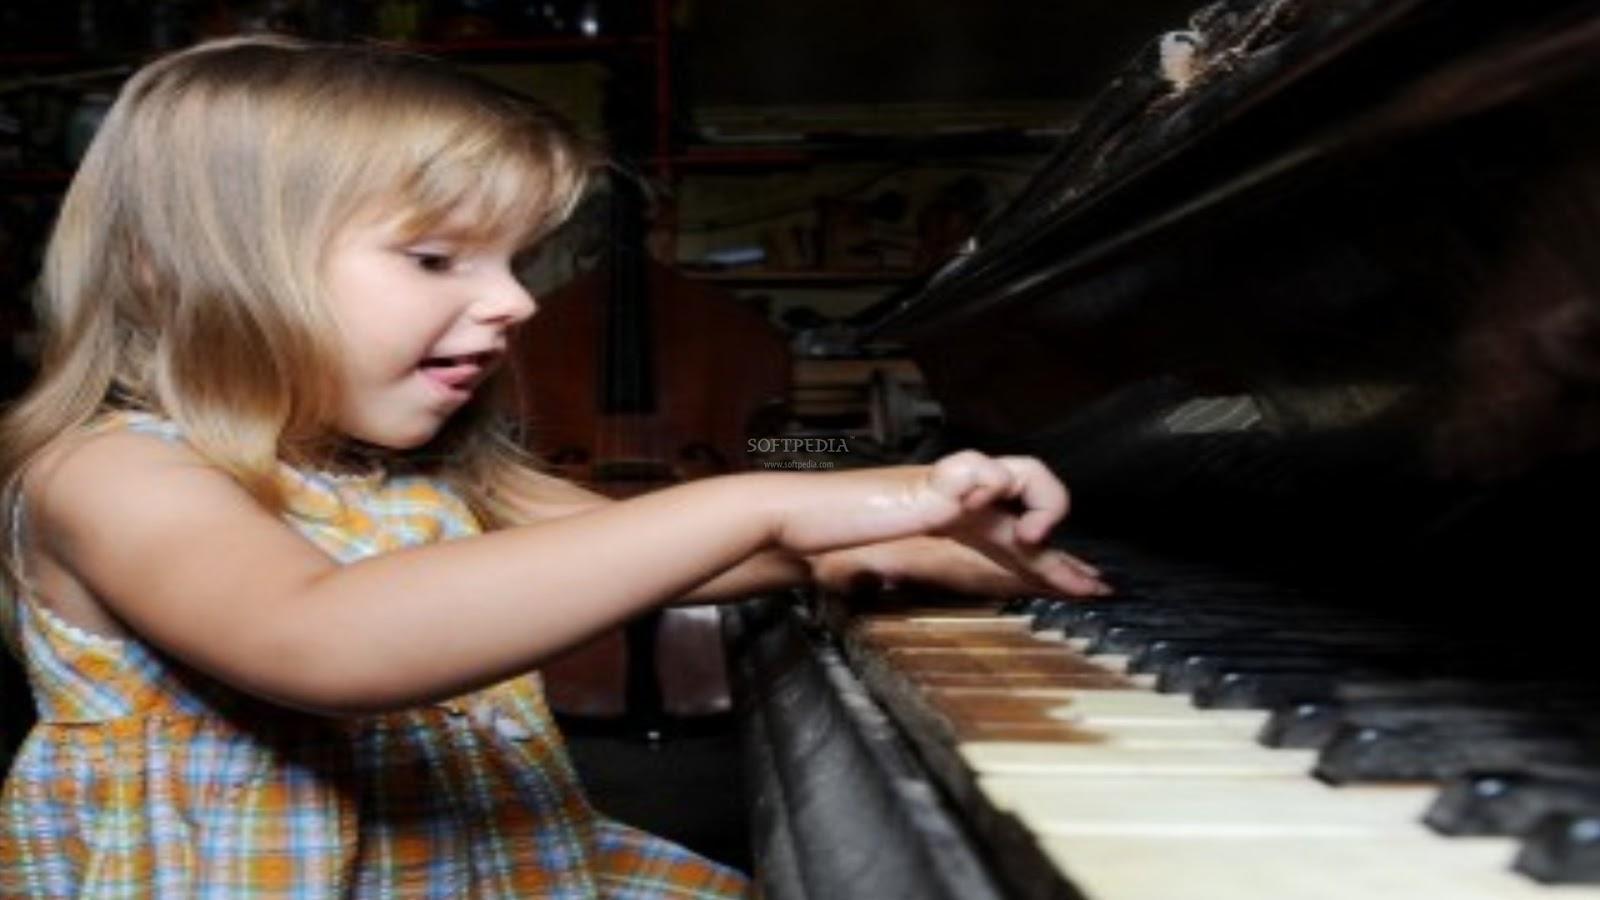 Learning the Piano    අමුතු අමුතු screen savers set එකක්...